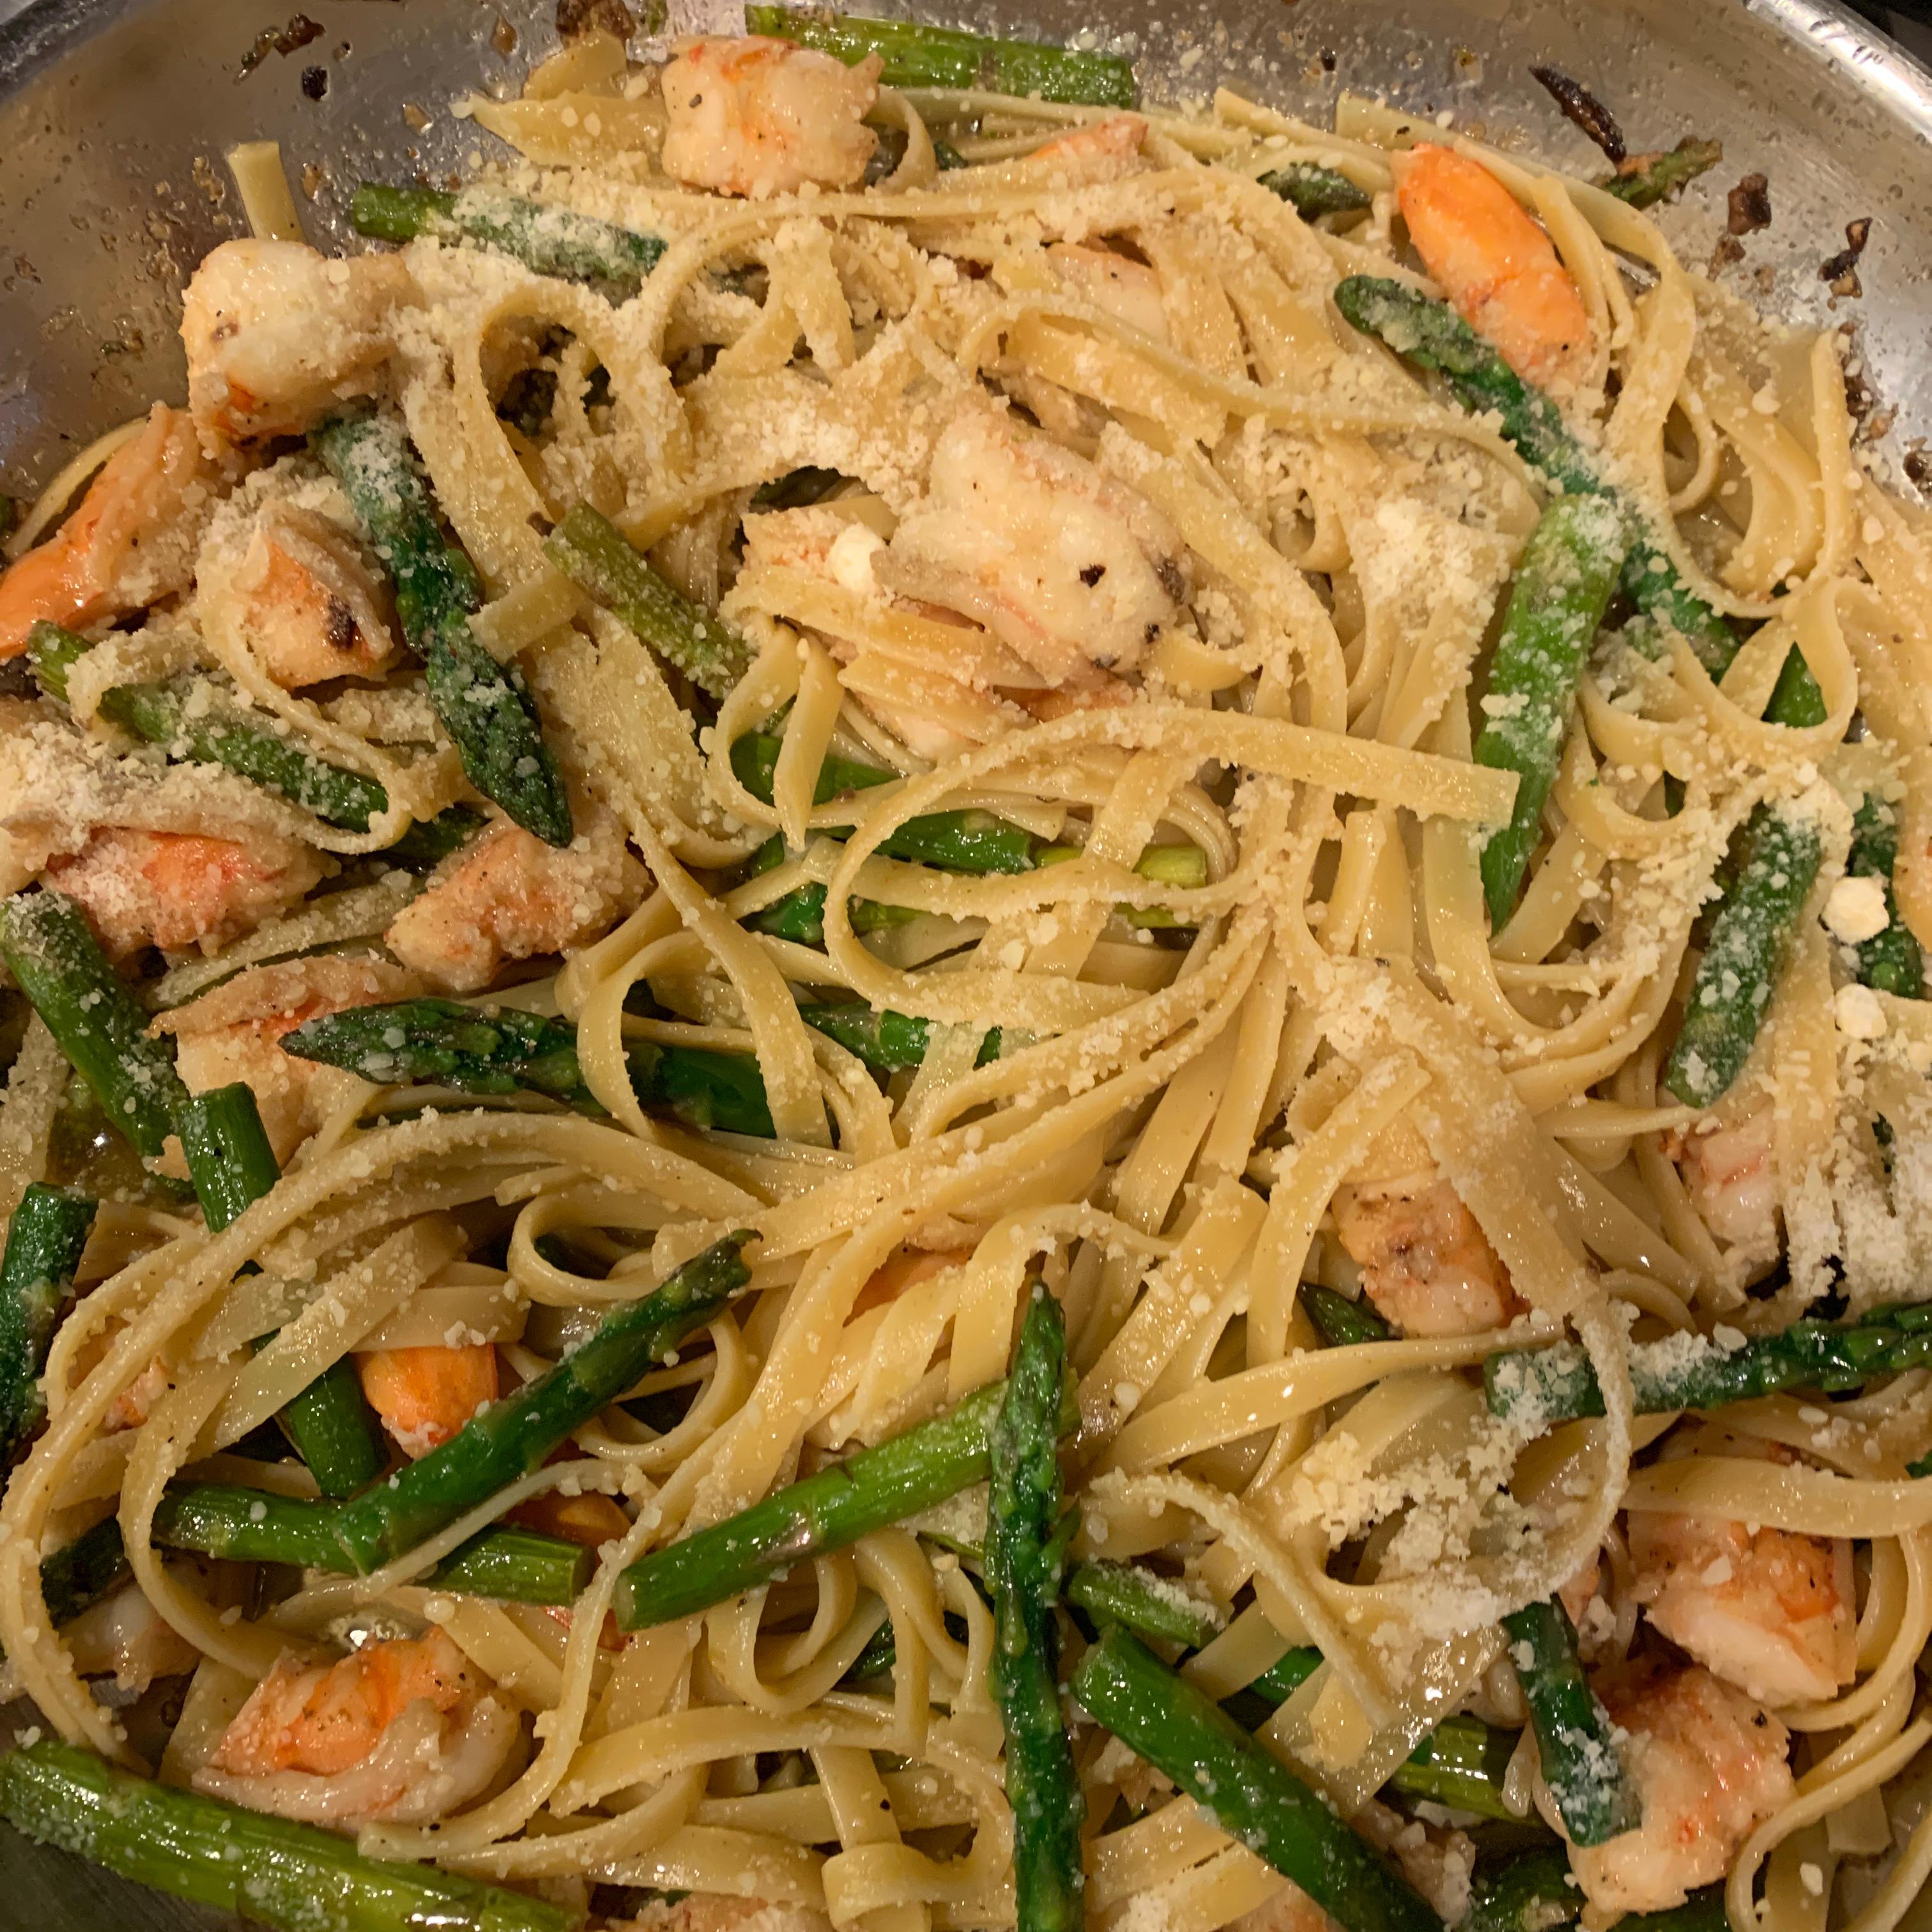 Shrimp and Asparagus Fettuccine needtobeinit@live.com